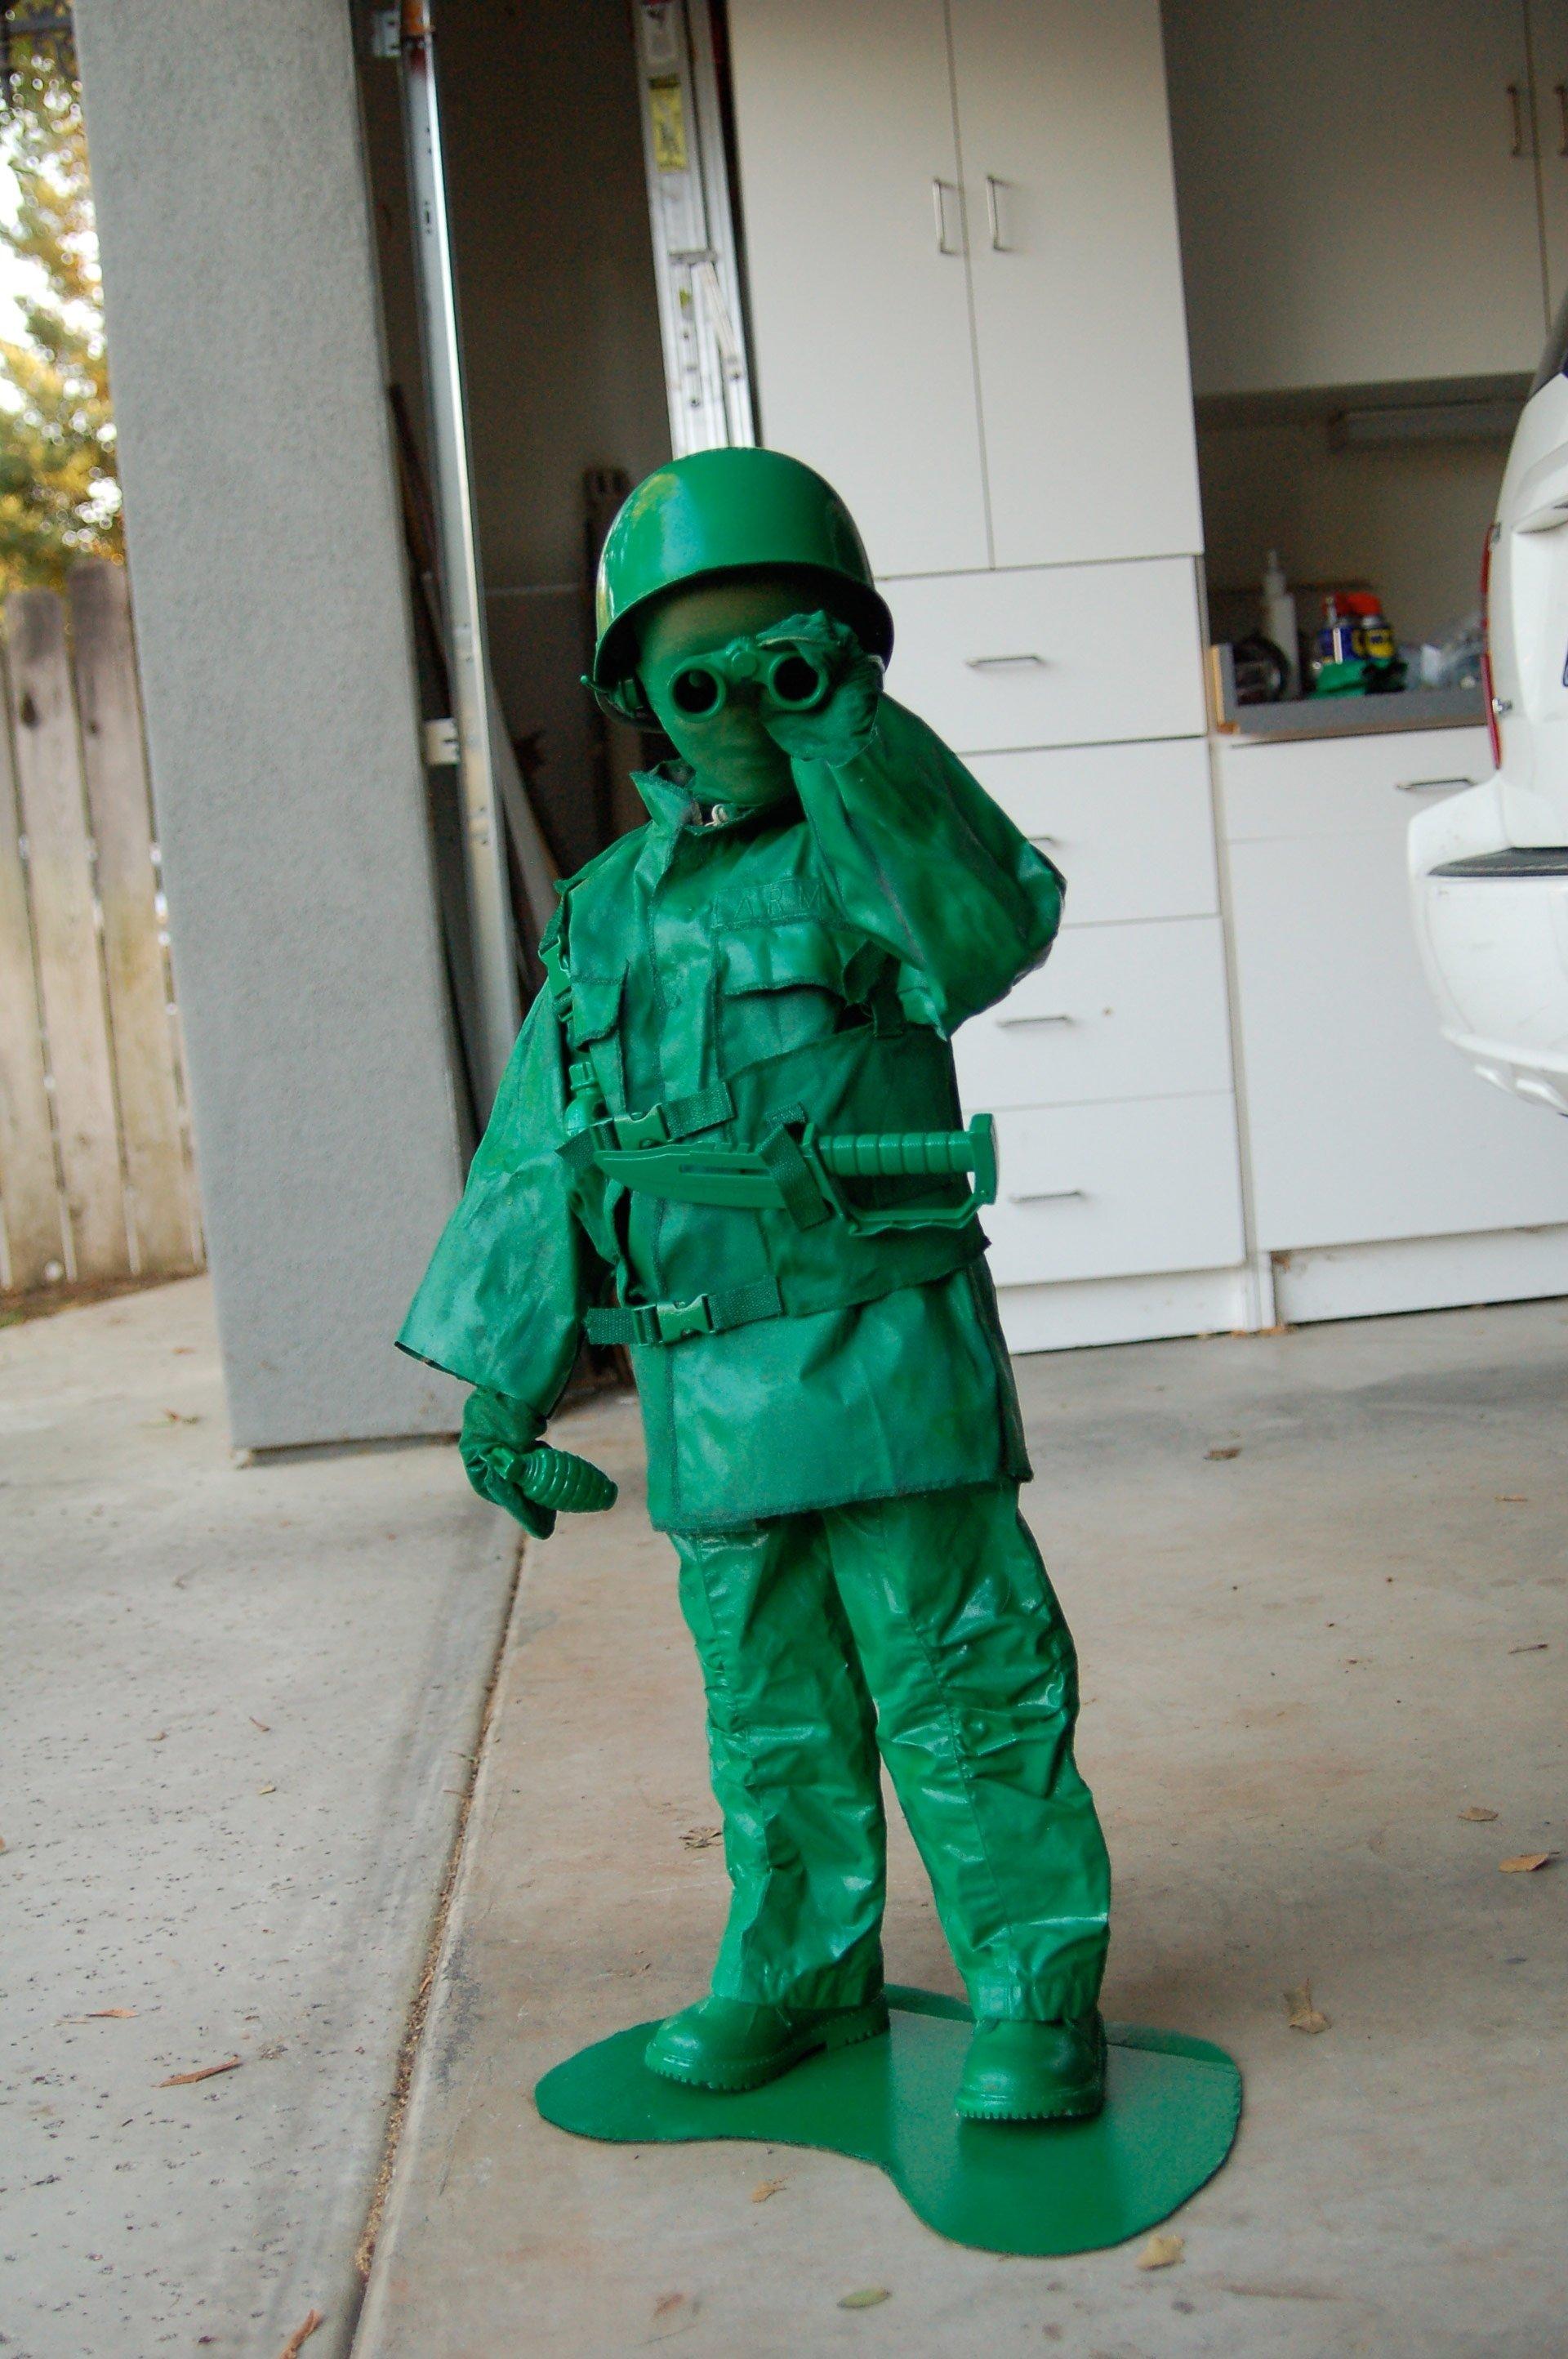 10 Awesome Boys Homemade Halloween Costume Ideas 62 utterly adorable homemade halloween costumes for kids army men 3